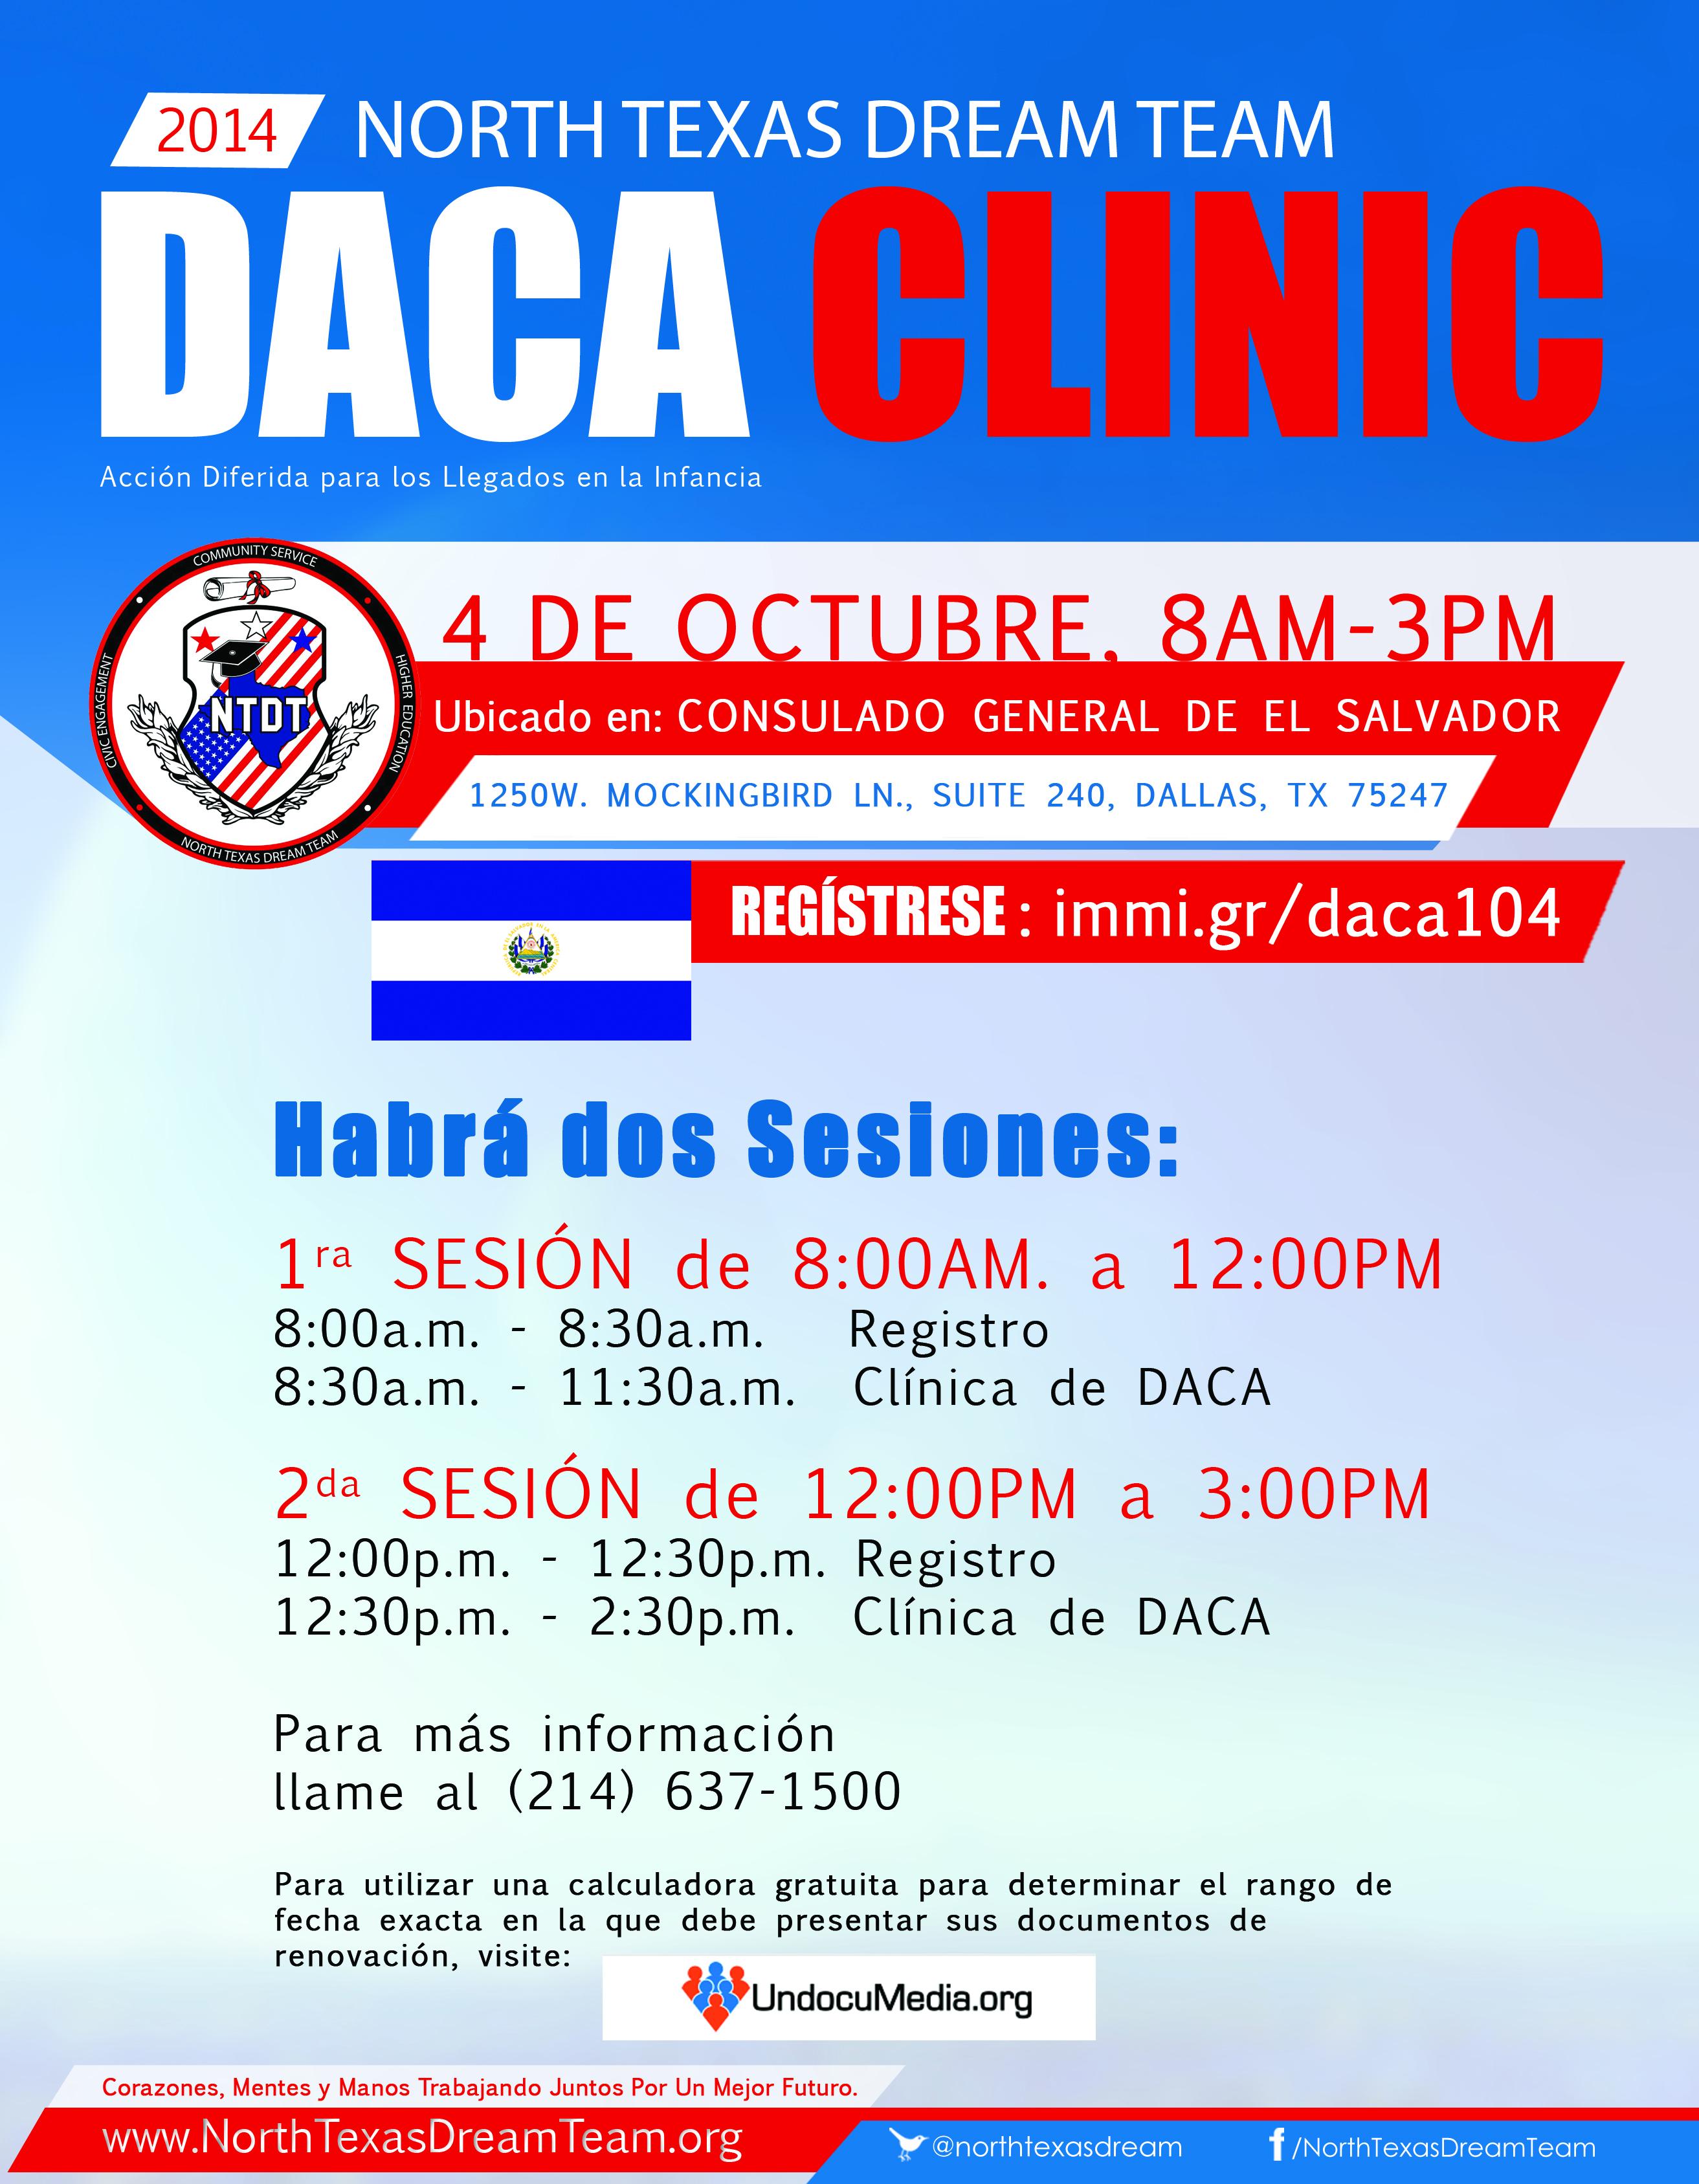 DACA Clinic